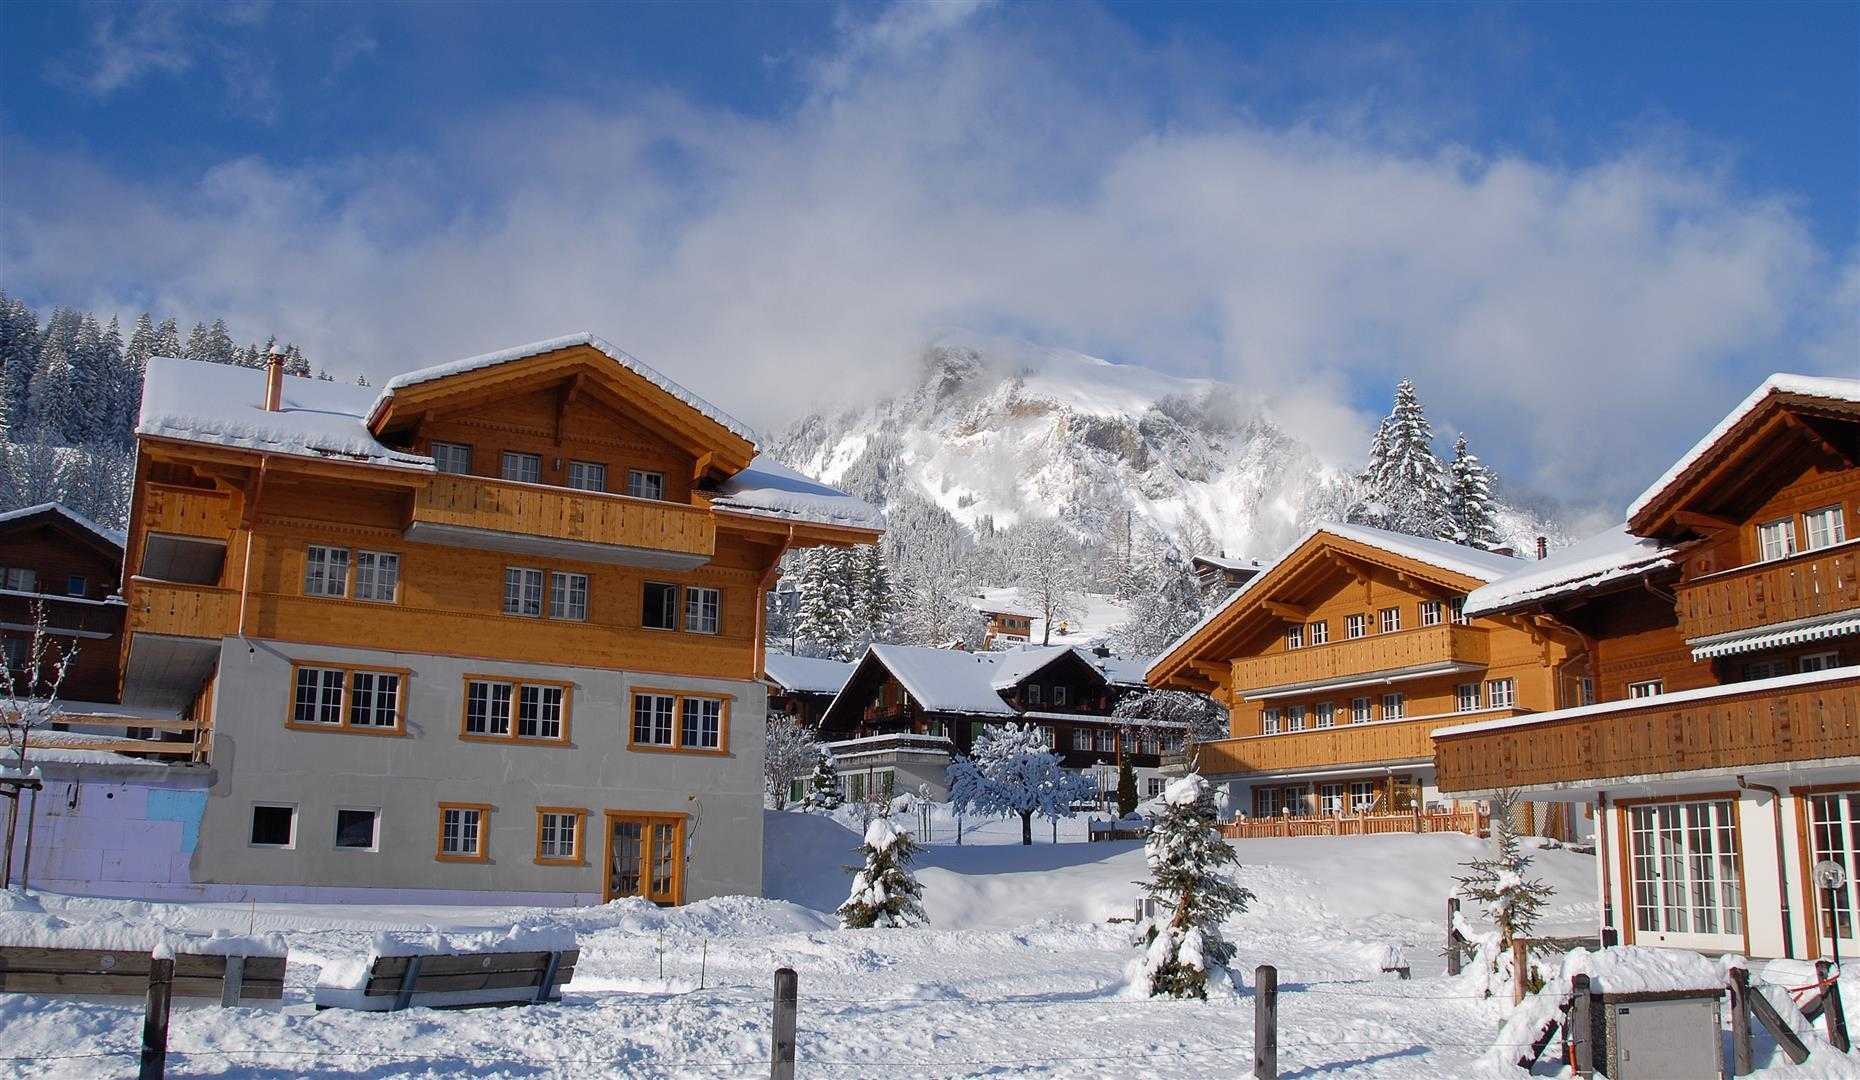 Agung Budi Raharsa | Architecture & Engineering Lenk Hotel - Switzerland Switzerland Switzerland Exterior-6 Minimalis  12750